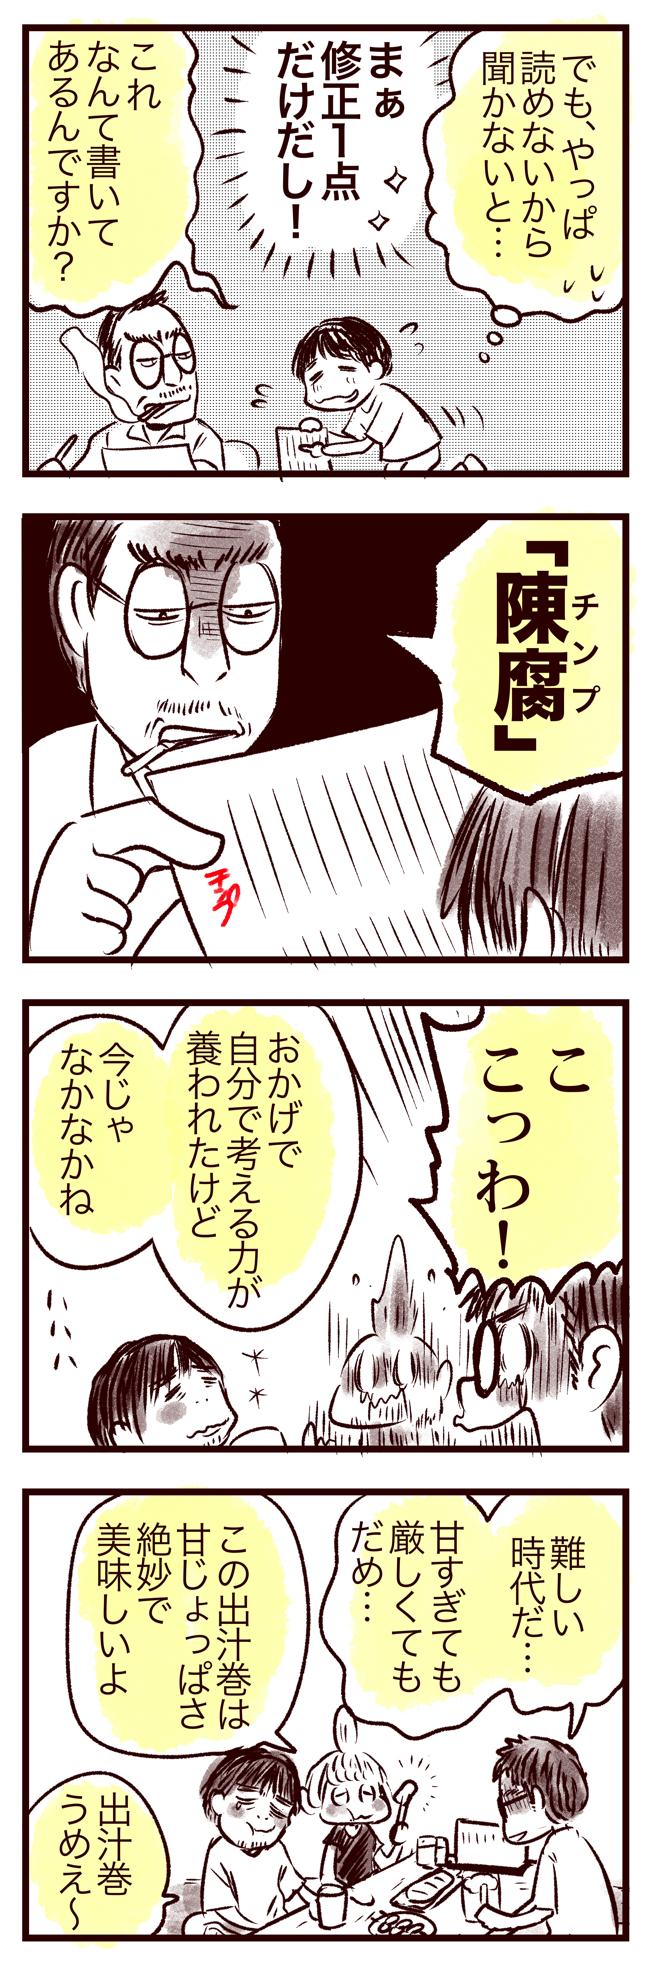 kouhai_003